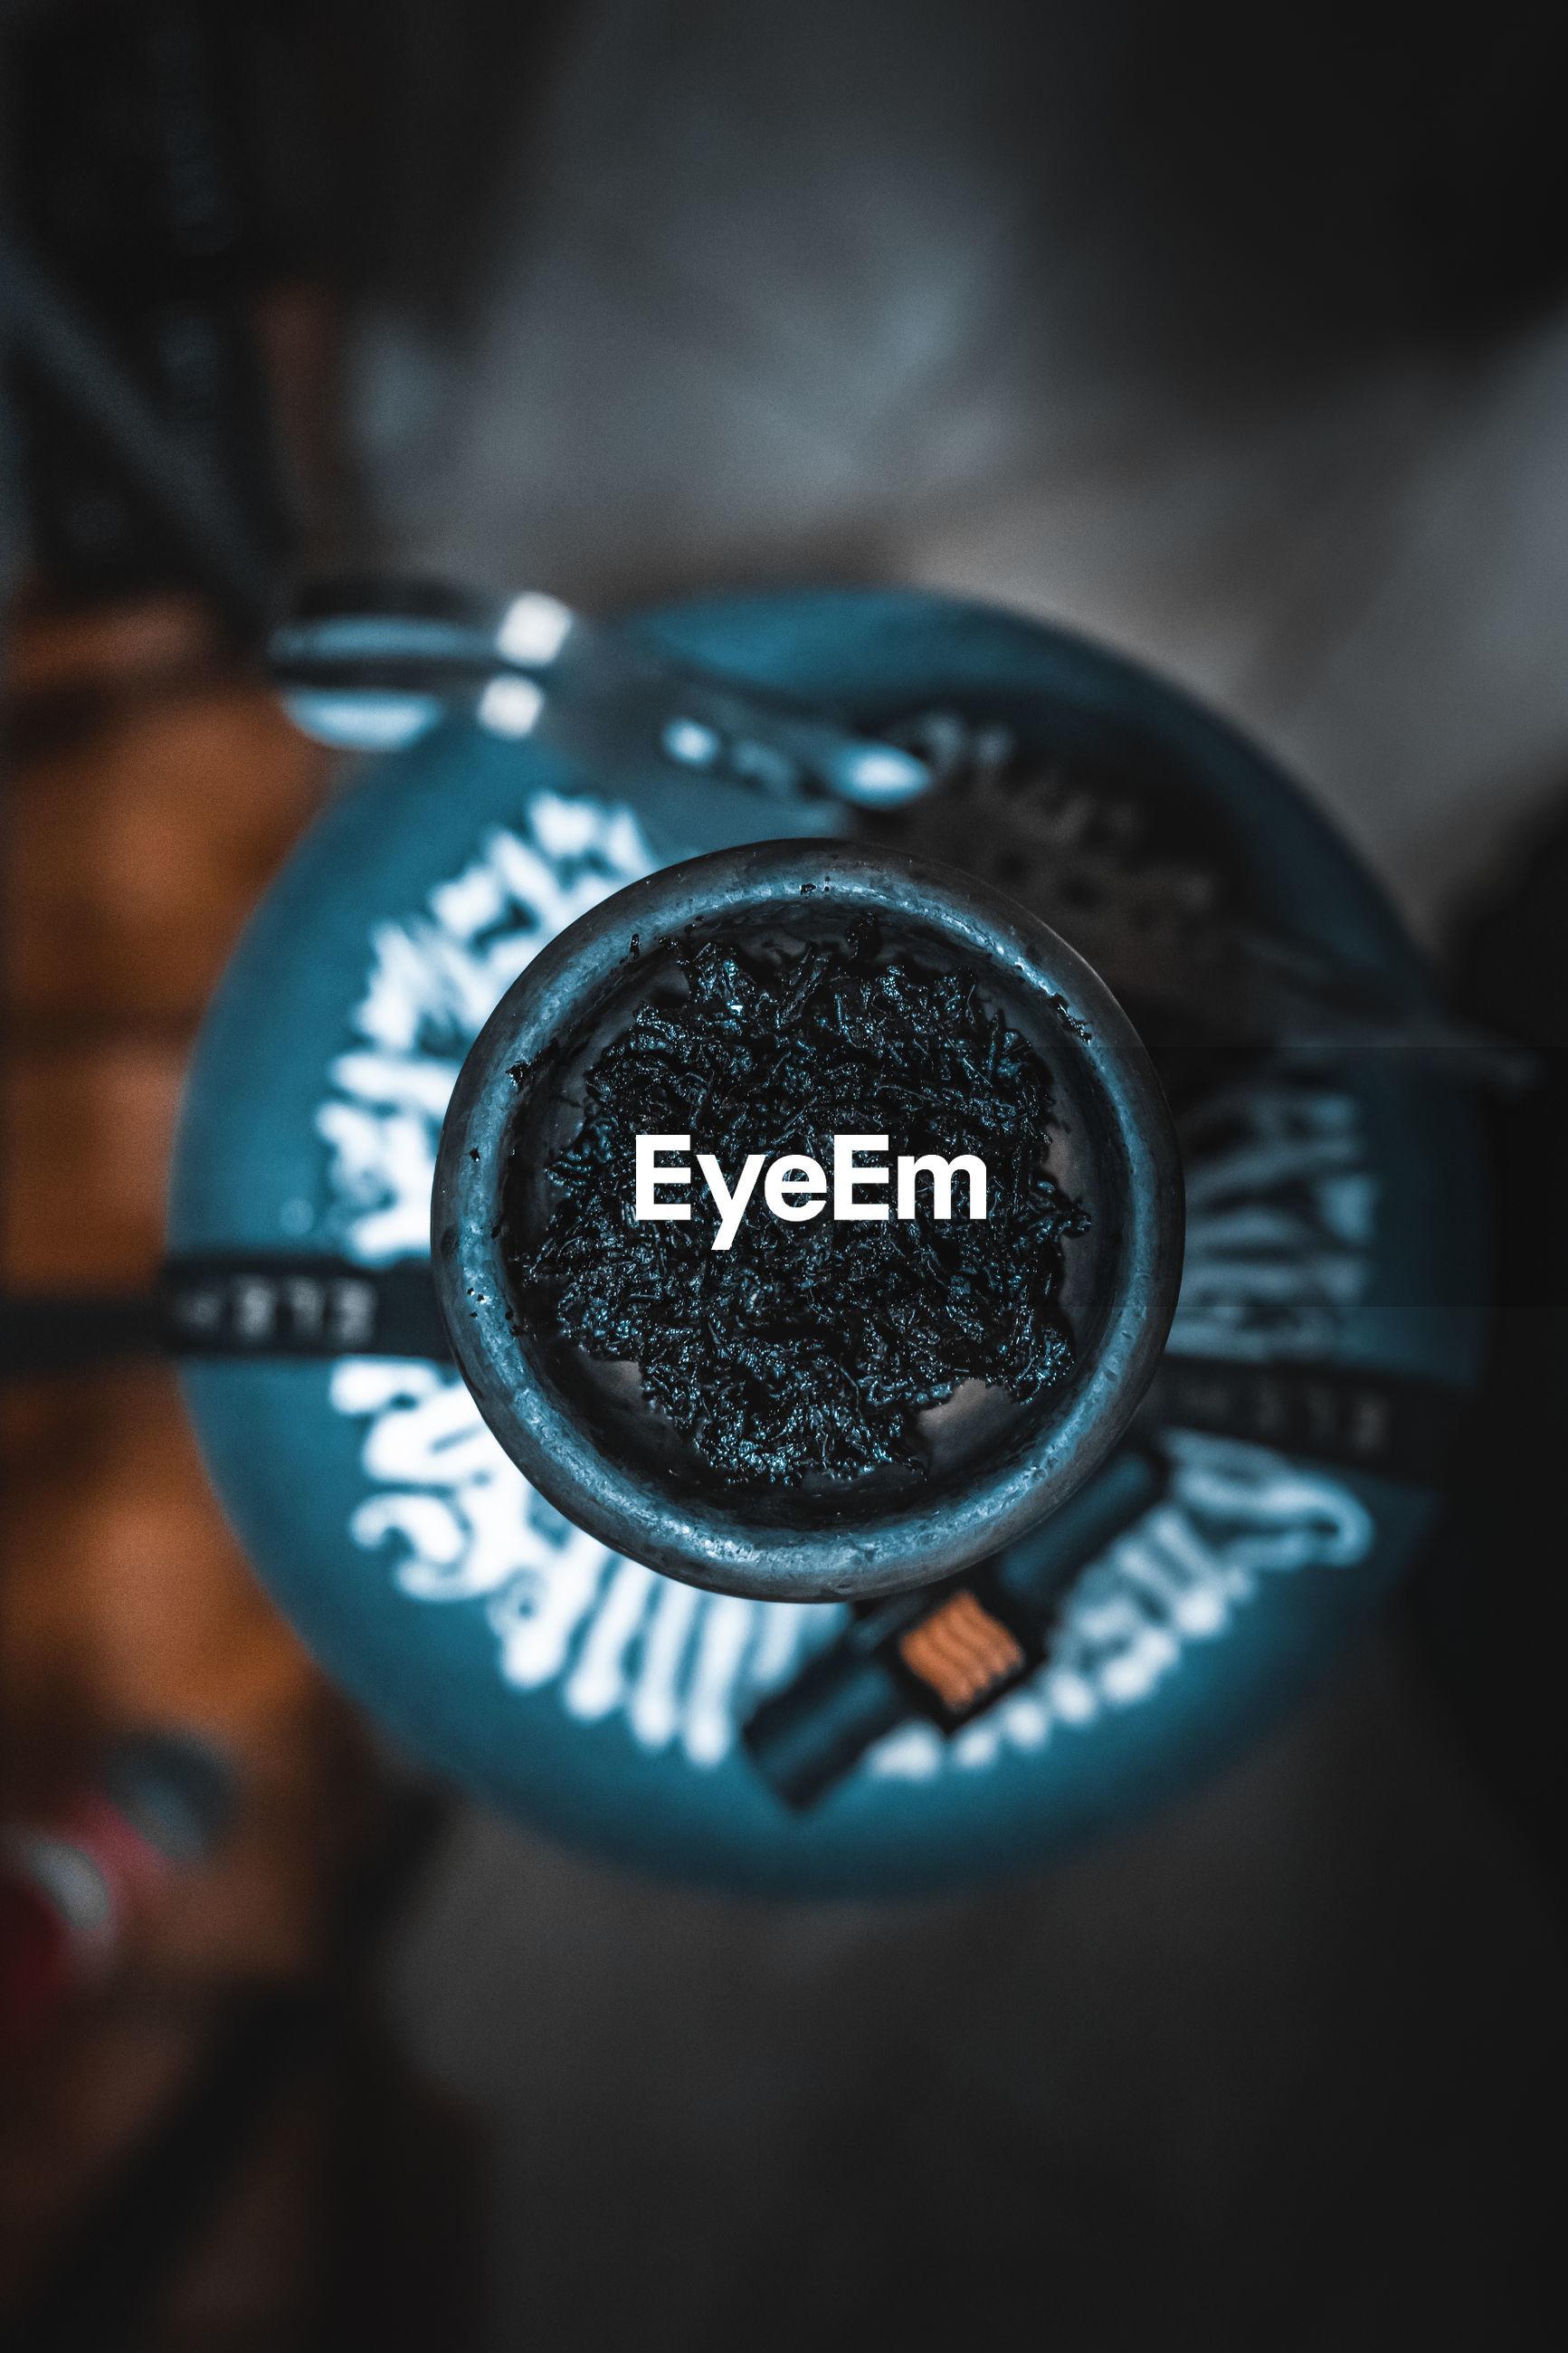 HIGH ANGLE VIEW OF BLACK COFFEE CUP ON METAL